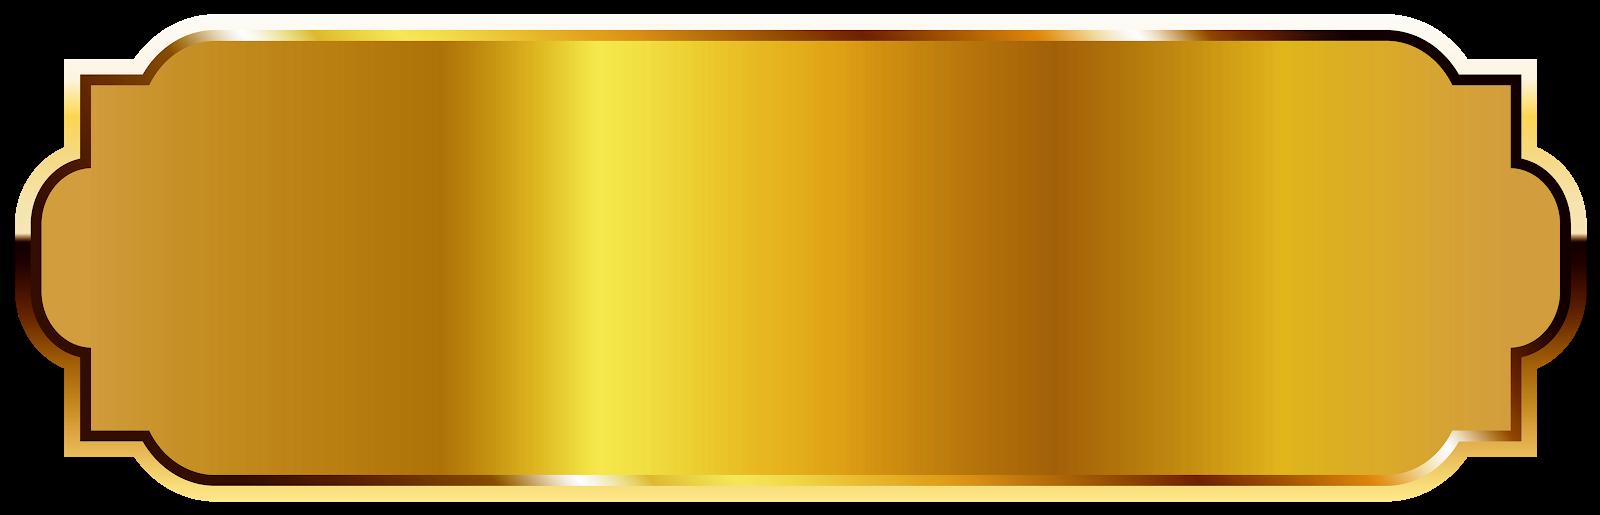 Gold Label Picture 7xCOkPJBG3v3NqKQT4Bm